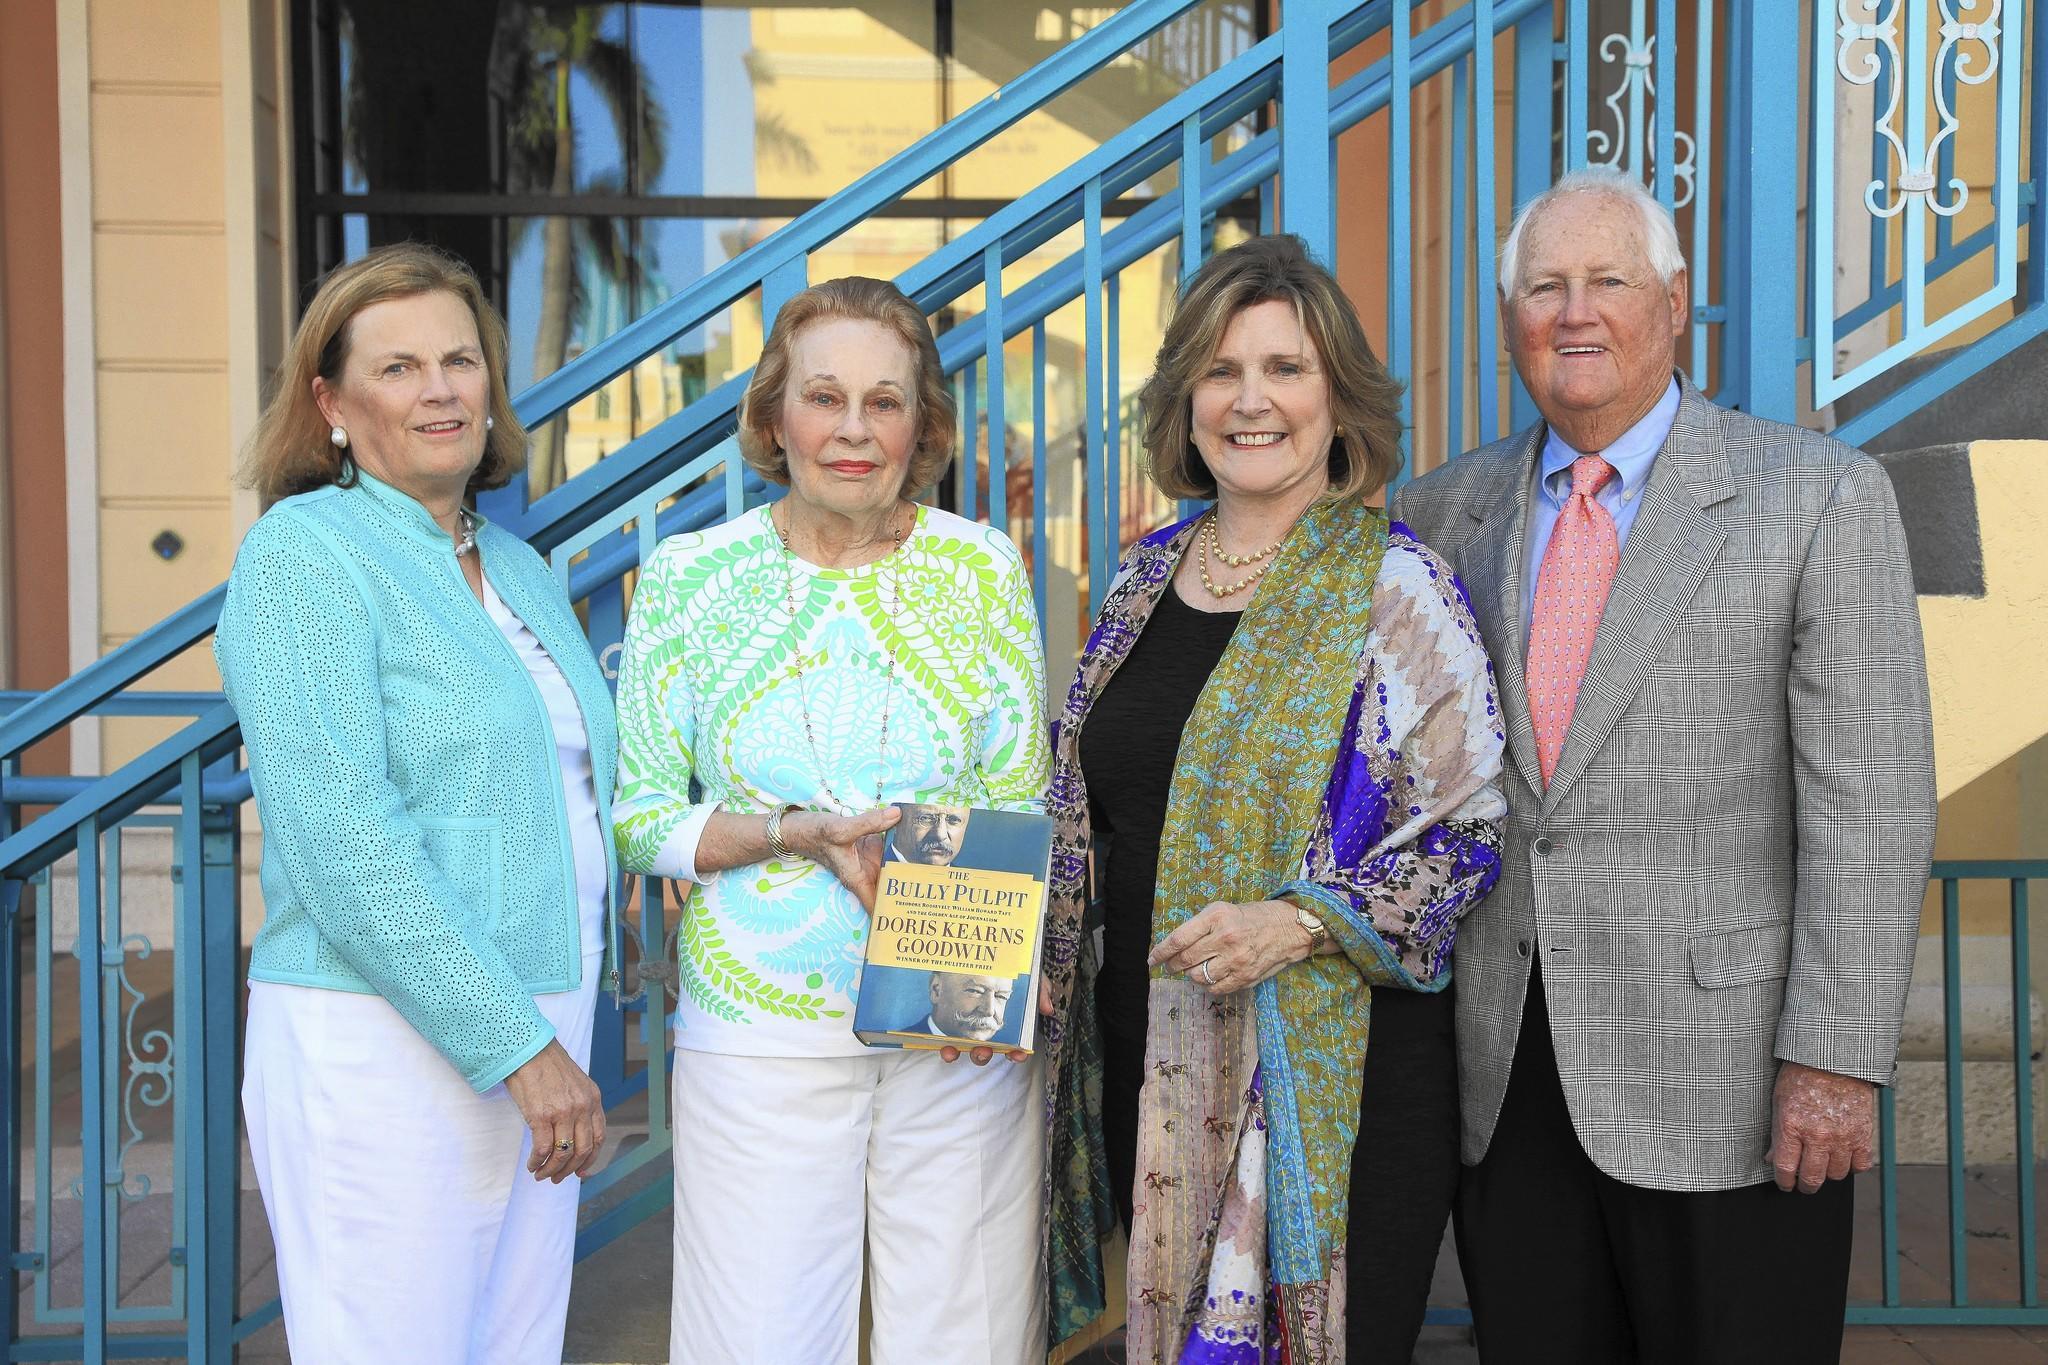 Cynthia Brown, left, Janice Middlebrook, Wendy Larsen and Bob Long